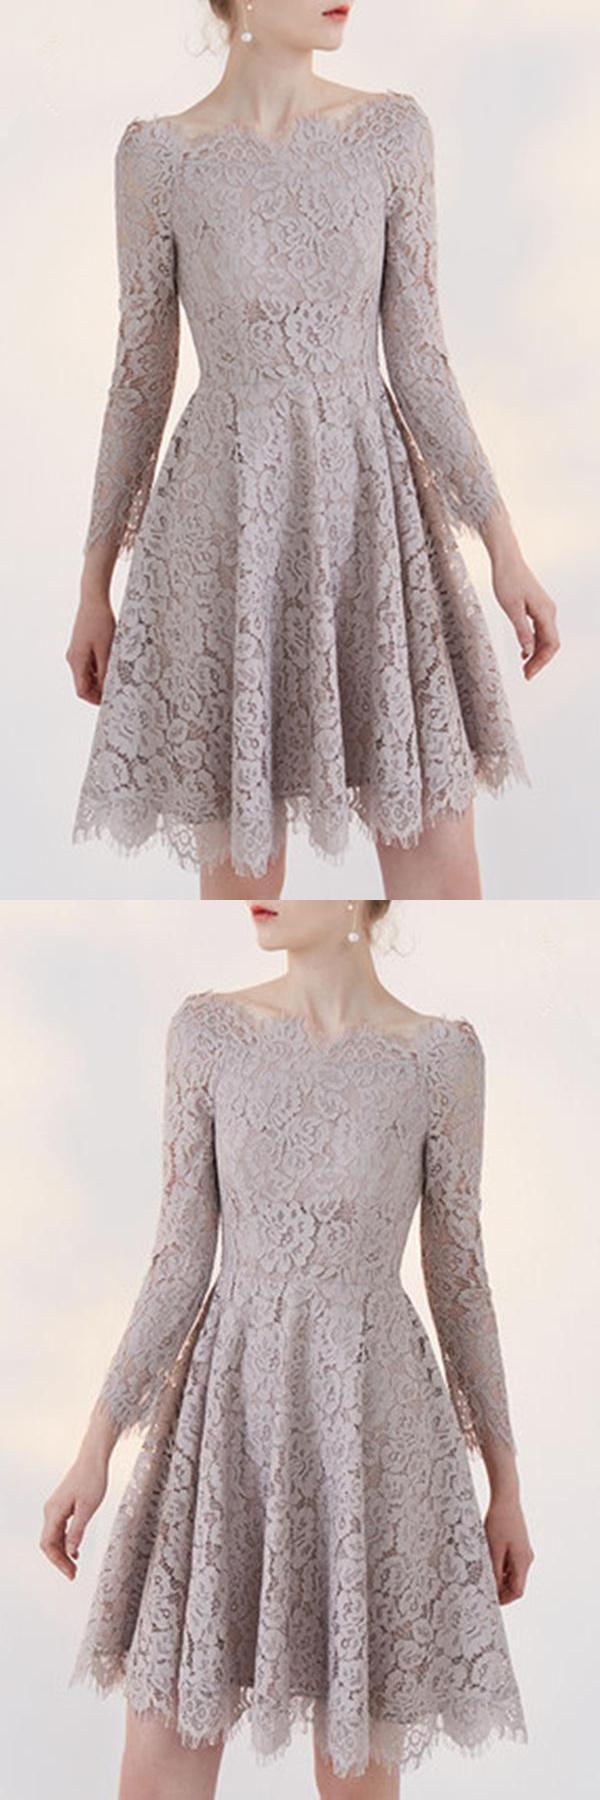 Cute prom dresses long sleeves prom dresses short prom dresses